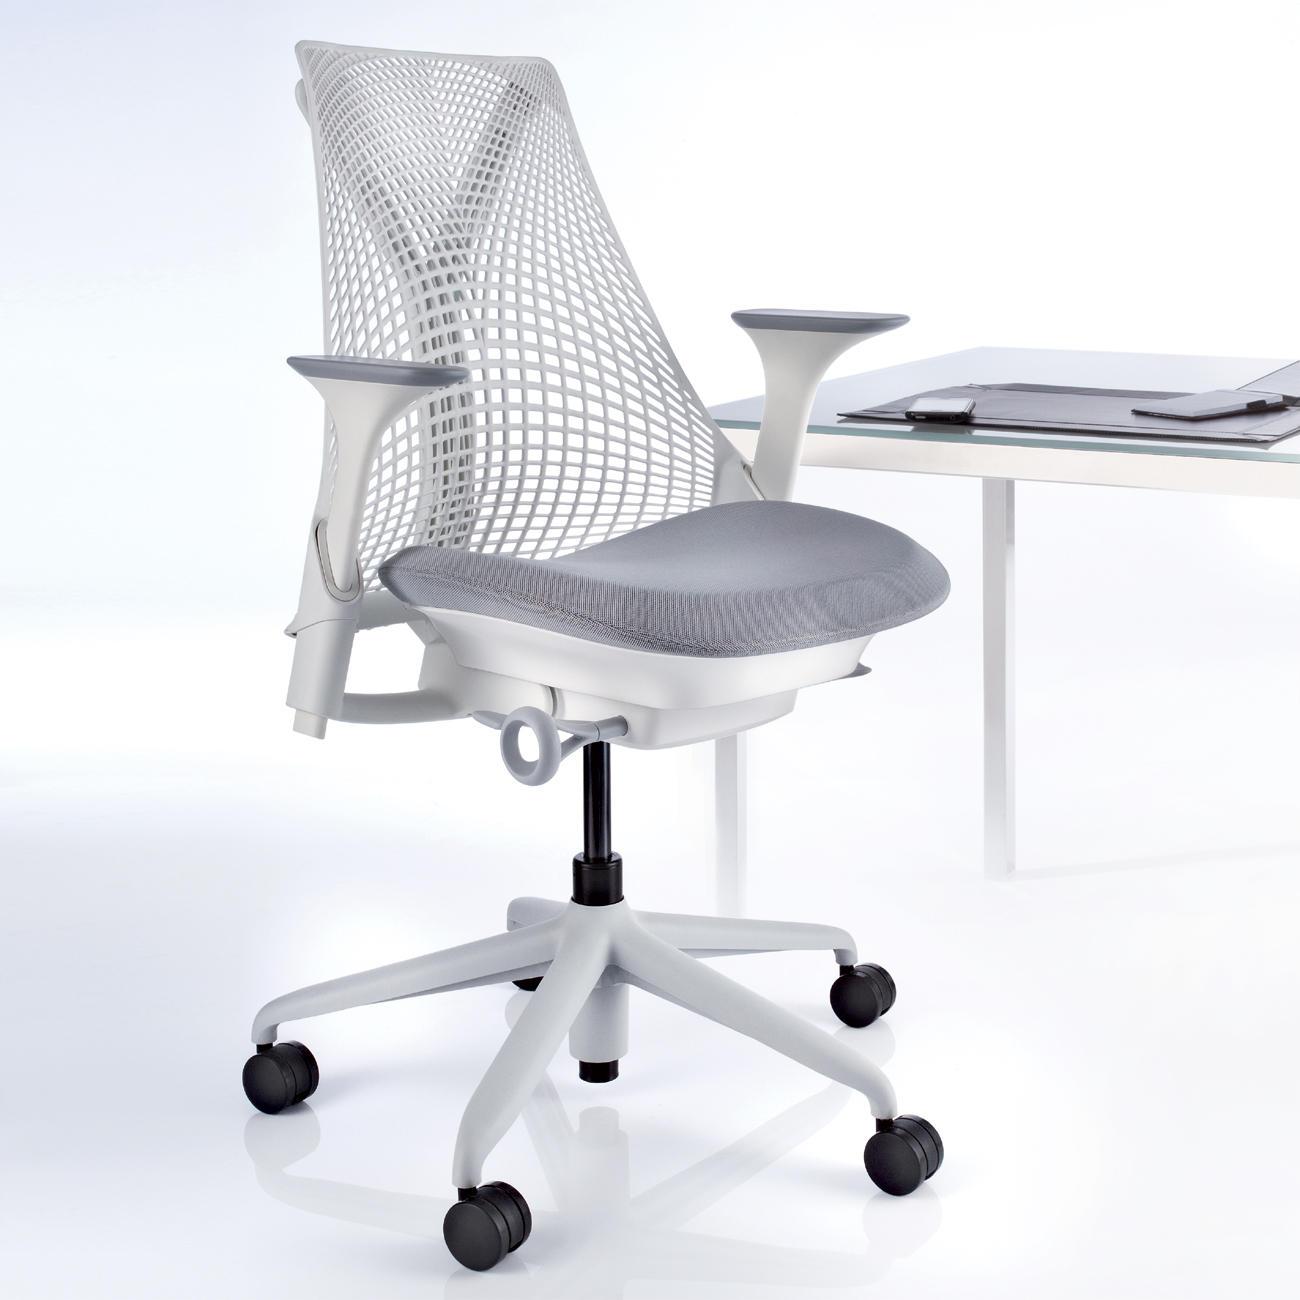 b rostuhl sayl 3 jahre garantie pro idee. Black Bedroom Furniture Sets. Home Design Ideas